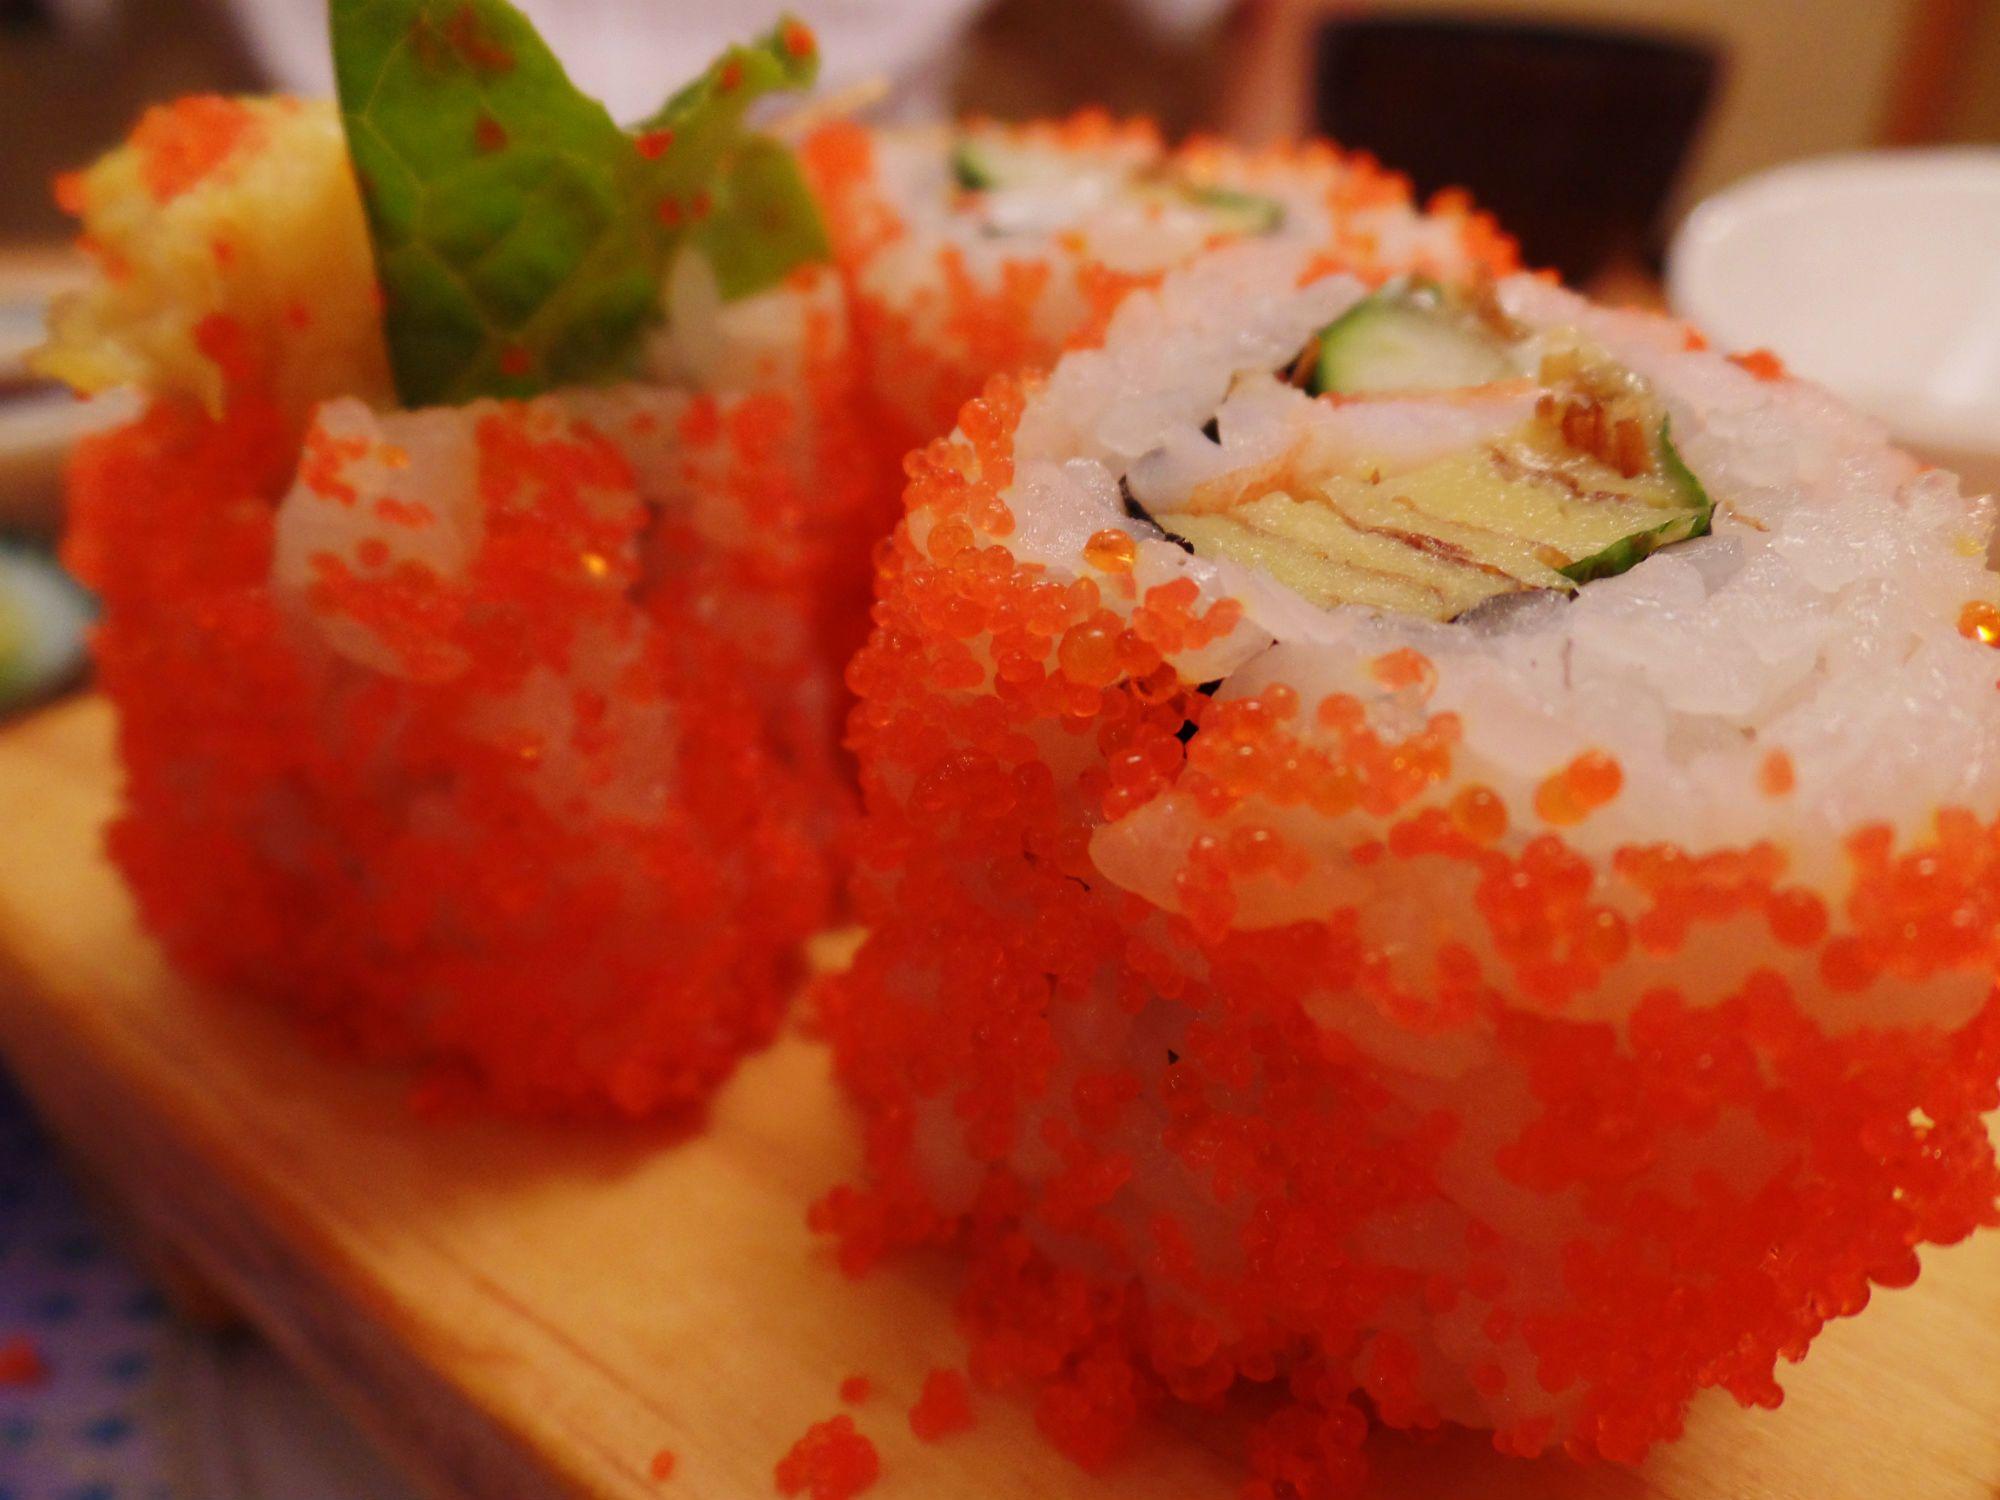 Review Gatten Sushi Delicious Restaurant Food Blog Sushi